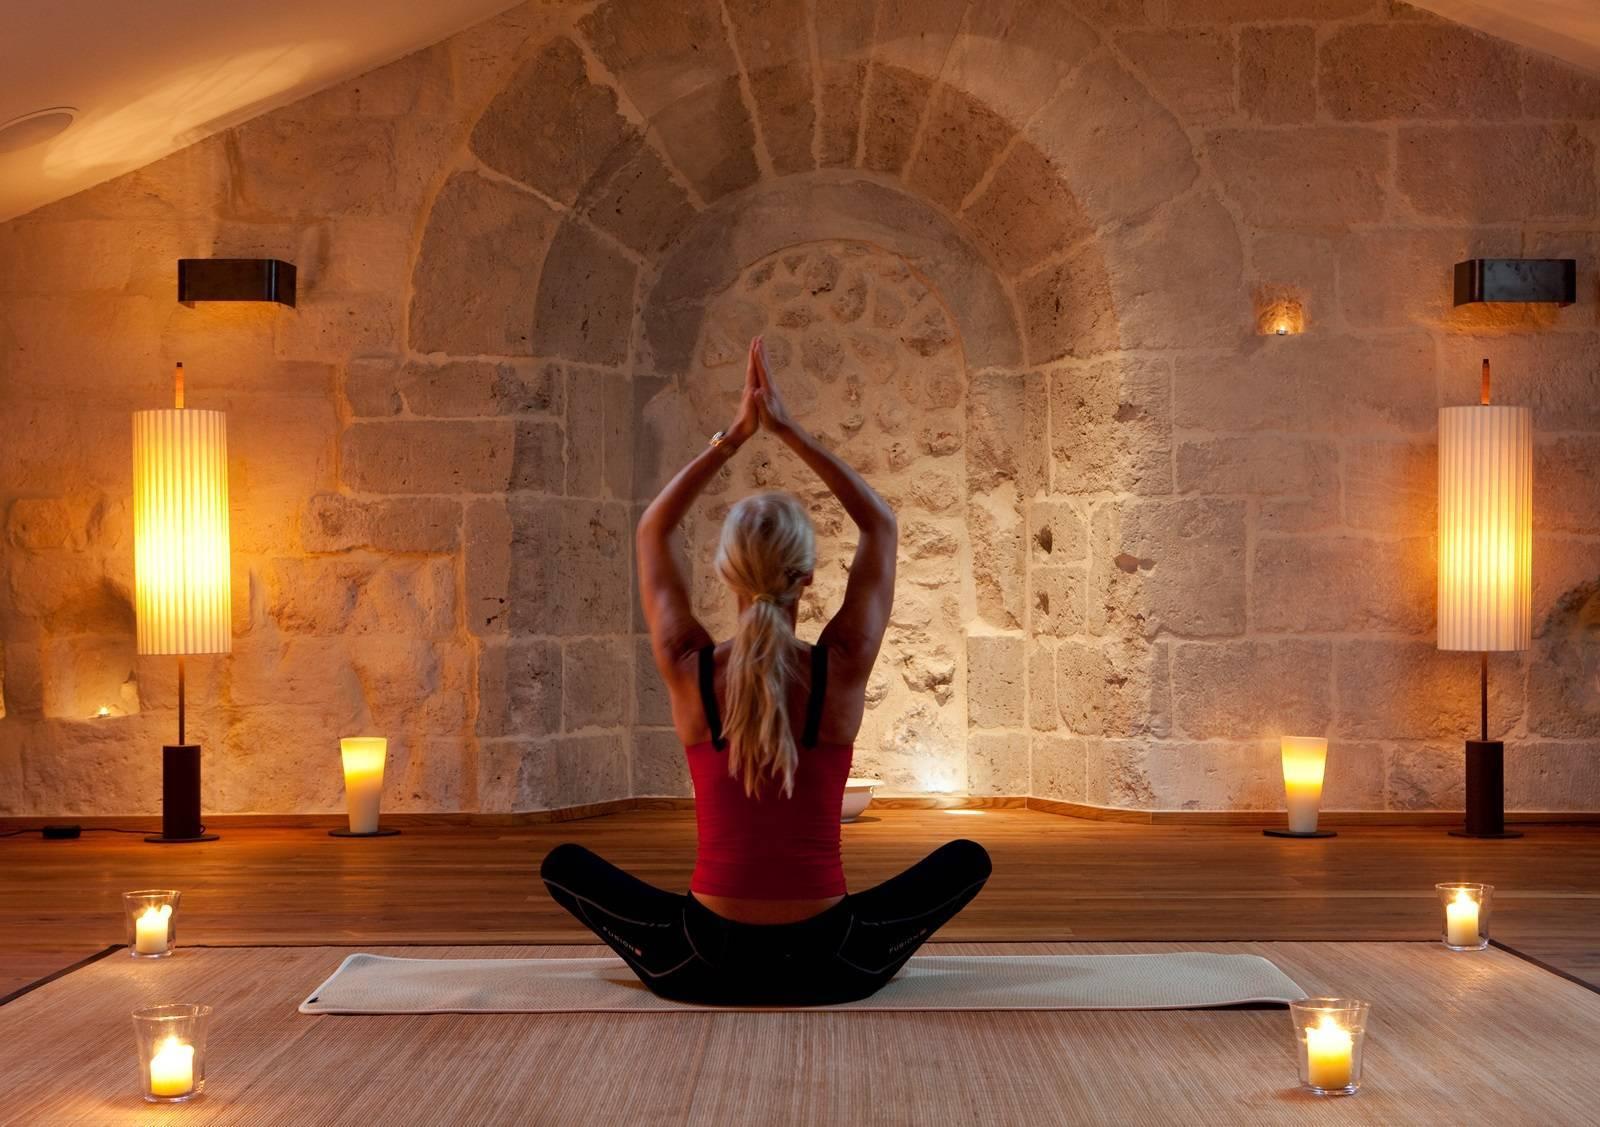 Медитация с мантрой «ом»